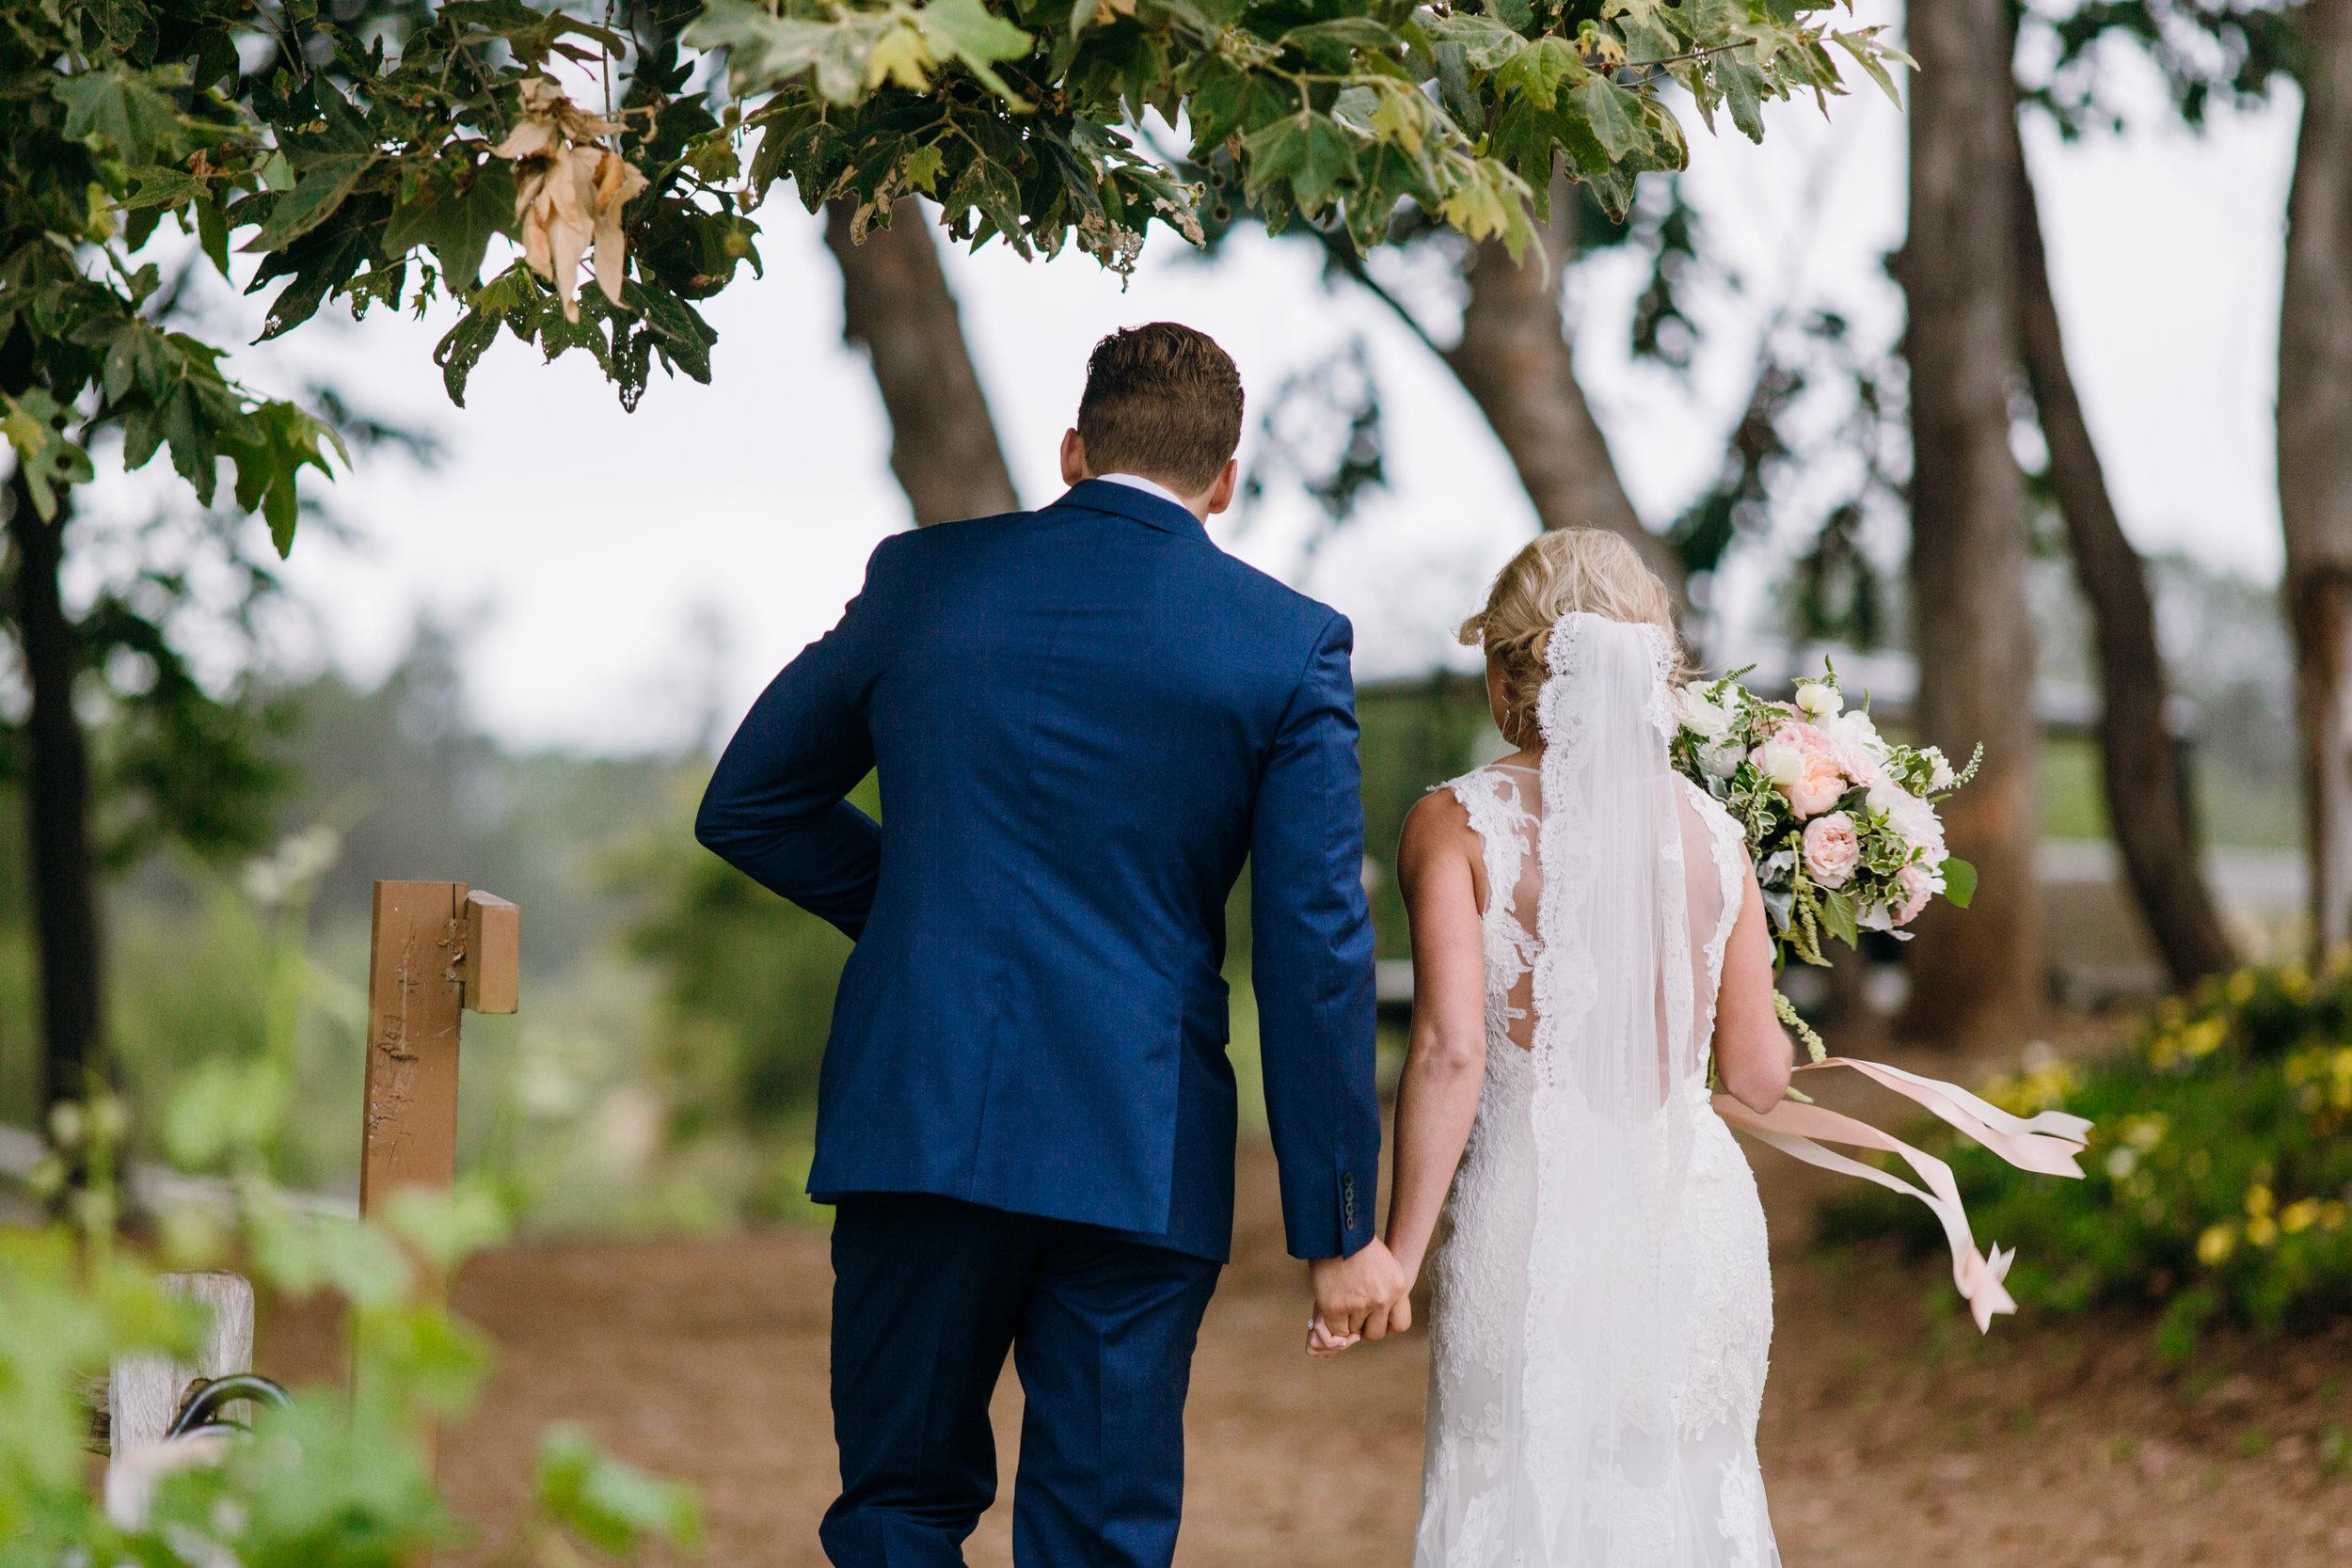 KaraNixonWeddings-LakeOakMeadows-Temecula-Wedding-38.jpg